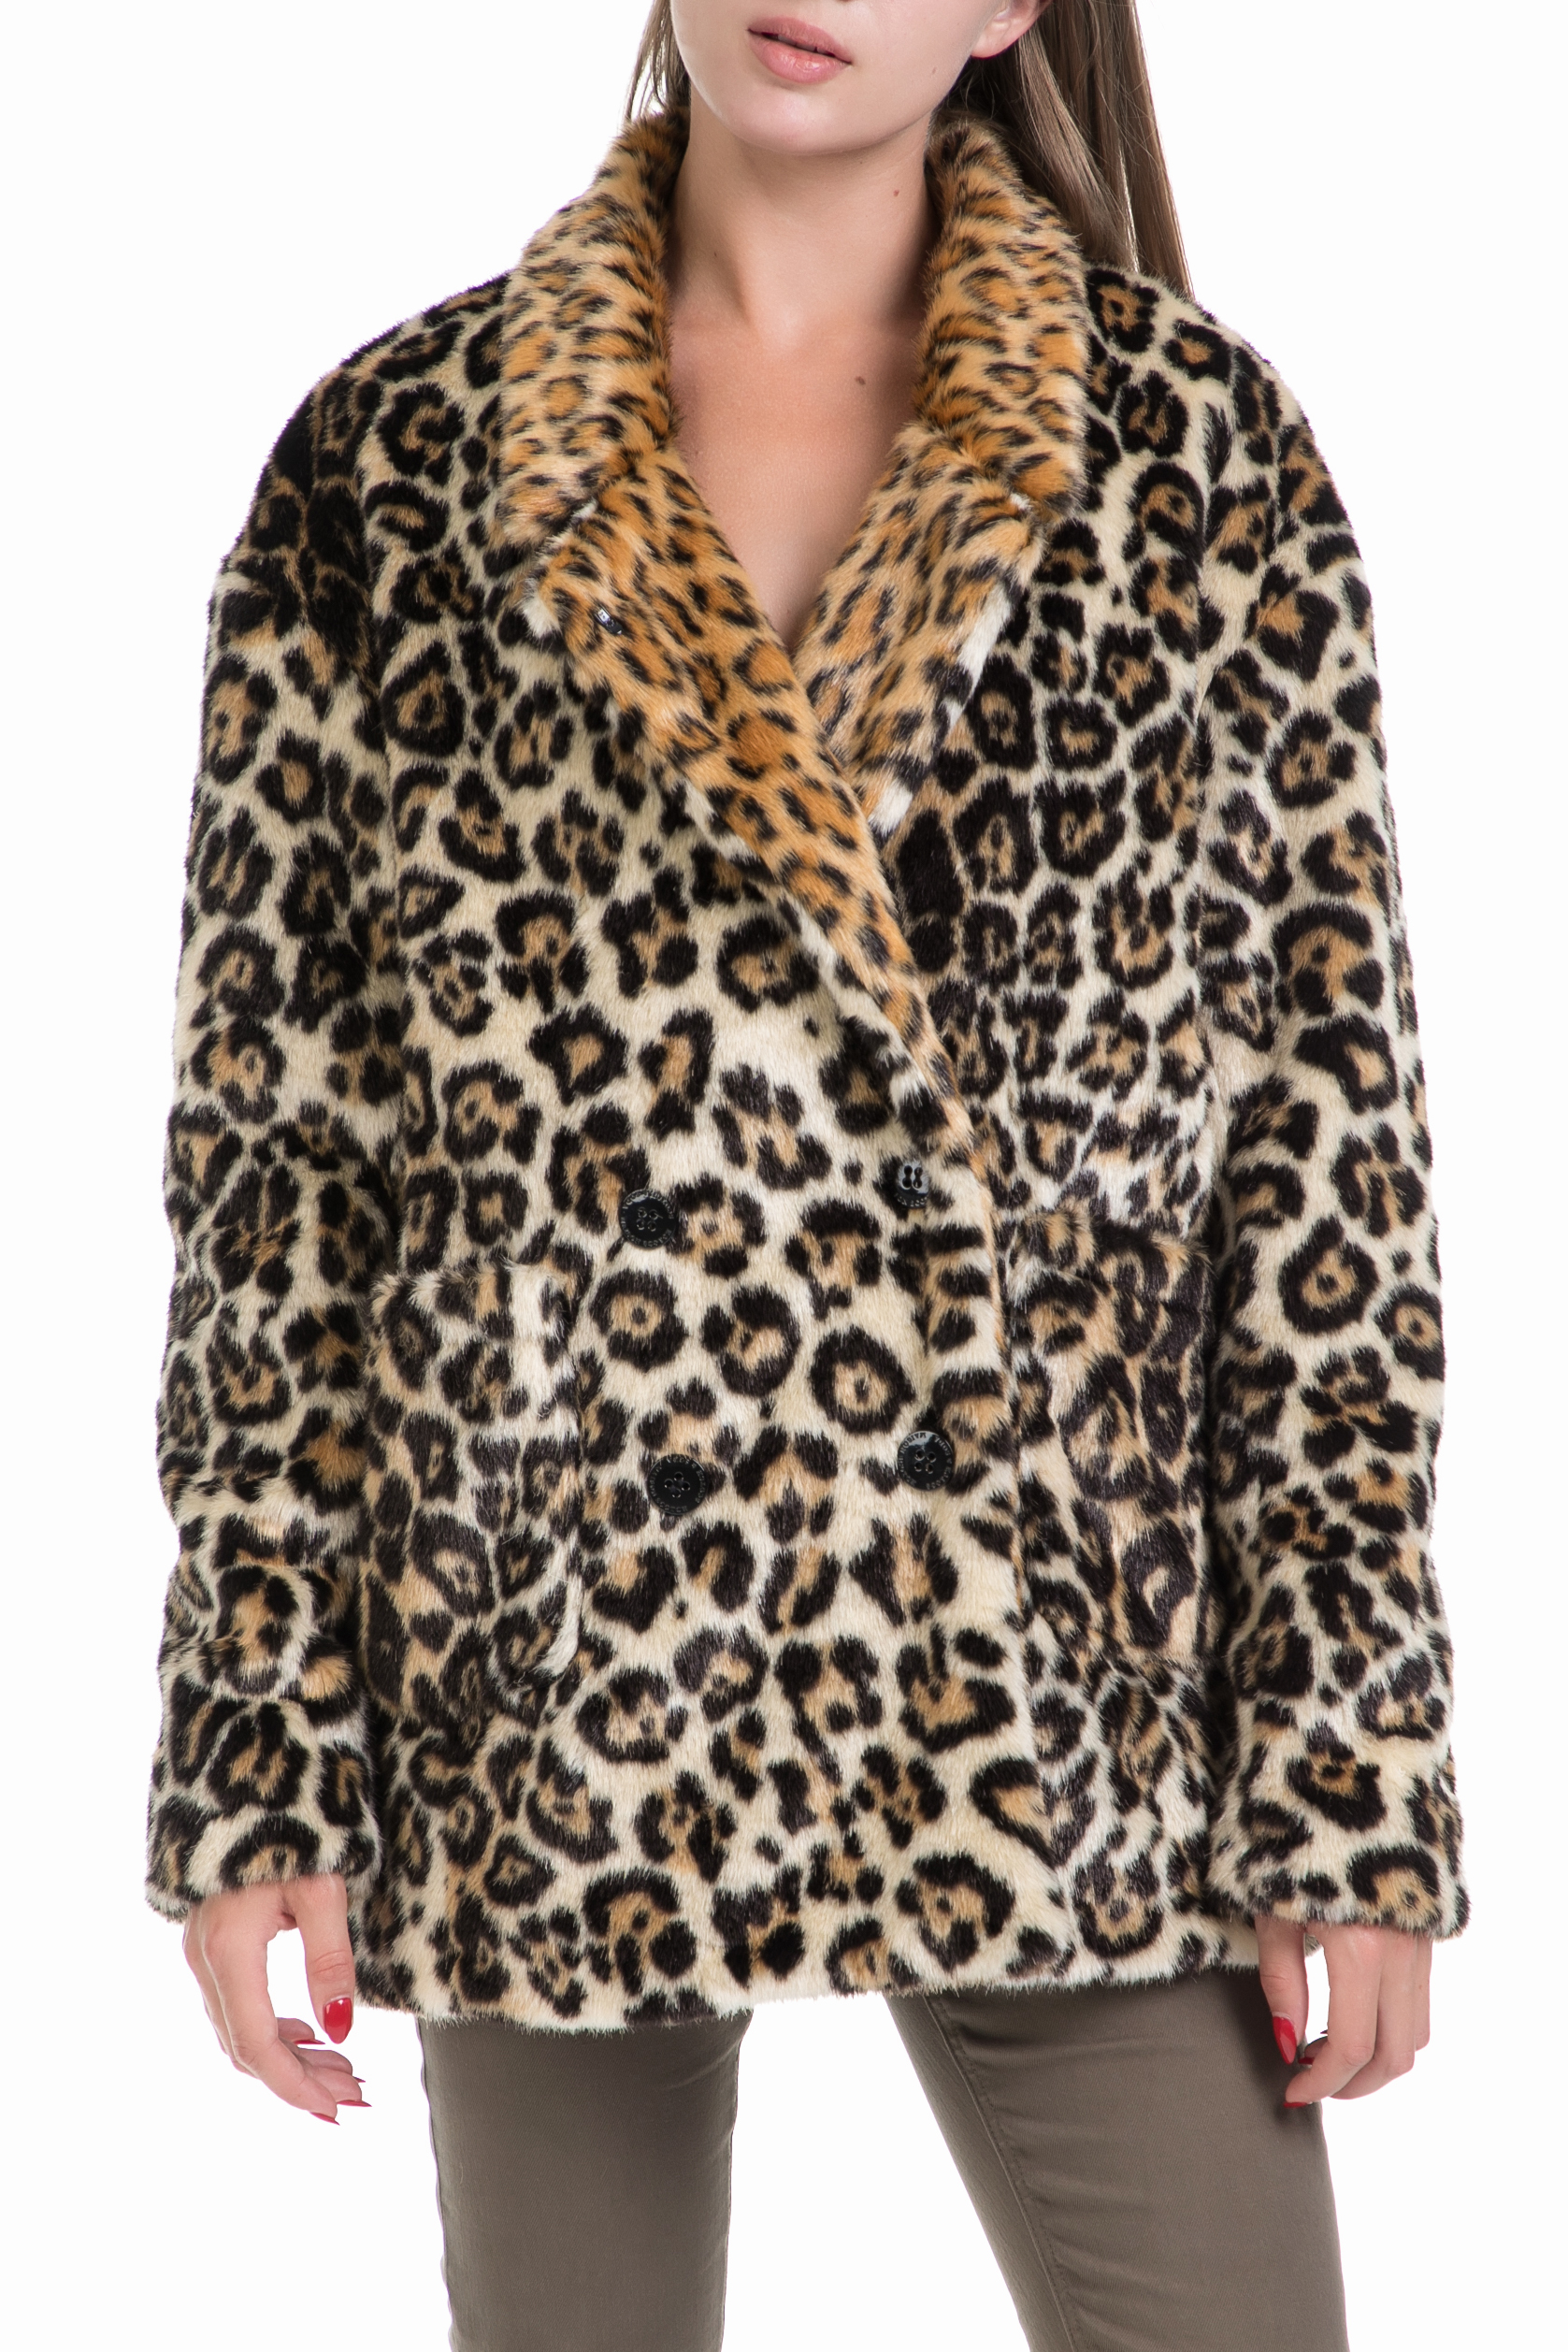 SCOTCH & SODA - Γυναικείο παλτό Maison Scotch λεοπάρ γυναικεία ρούχα πανωφόρια παλτό